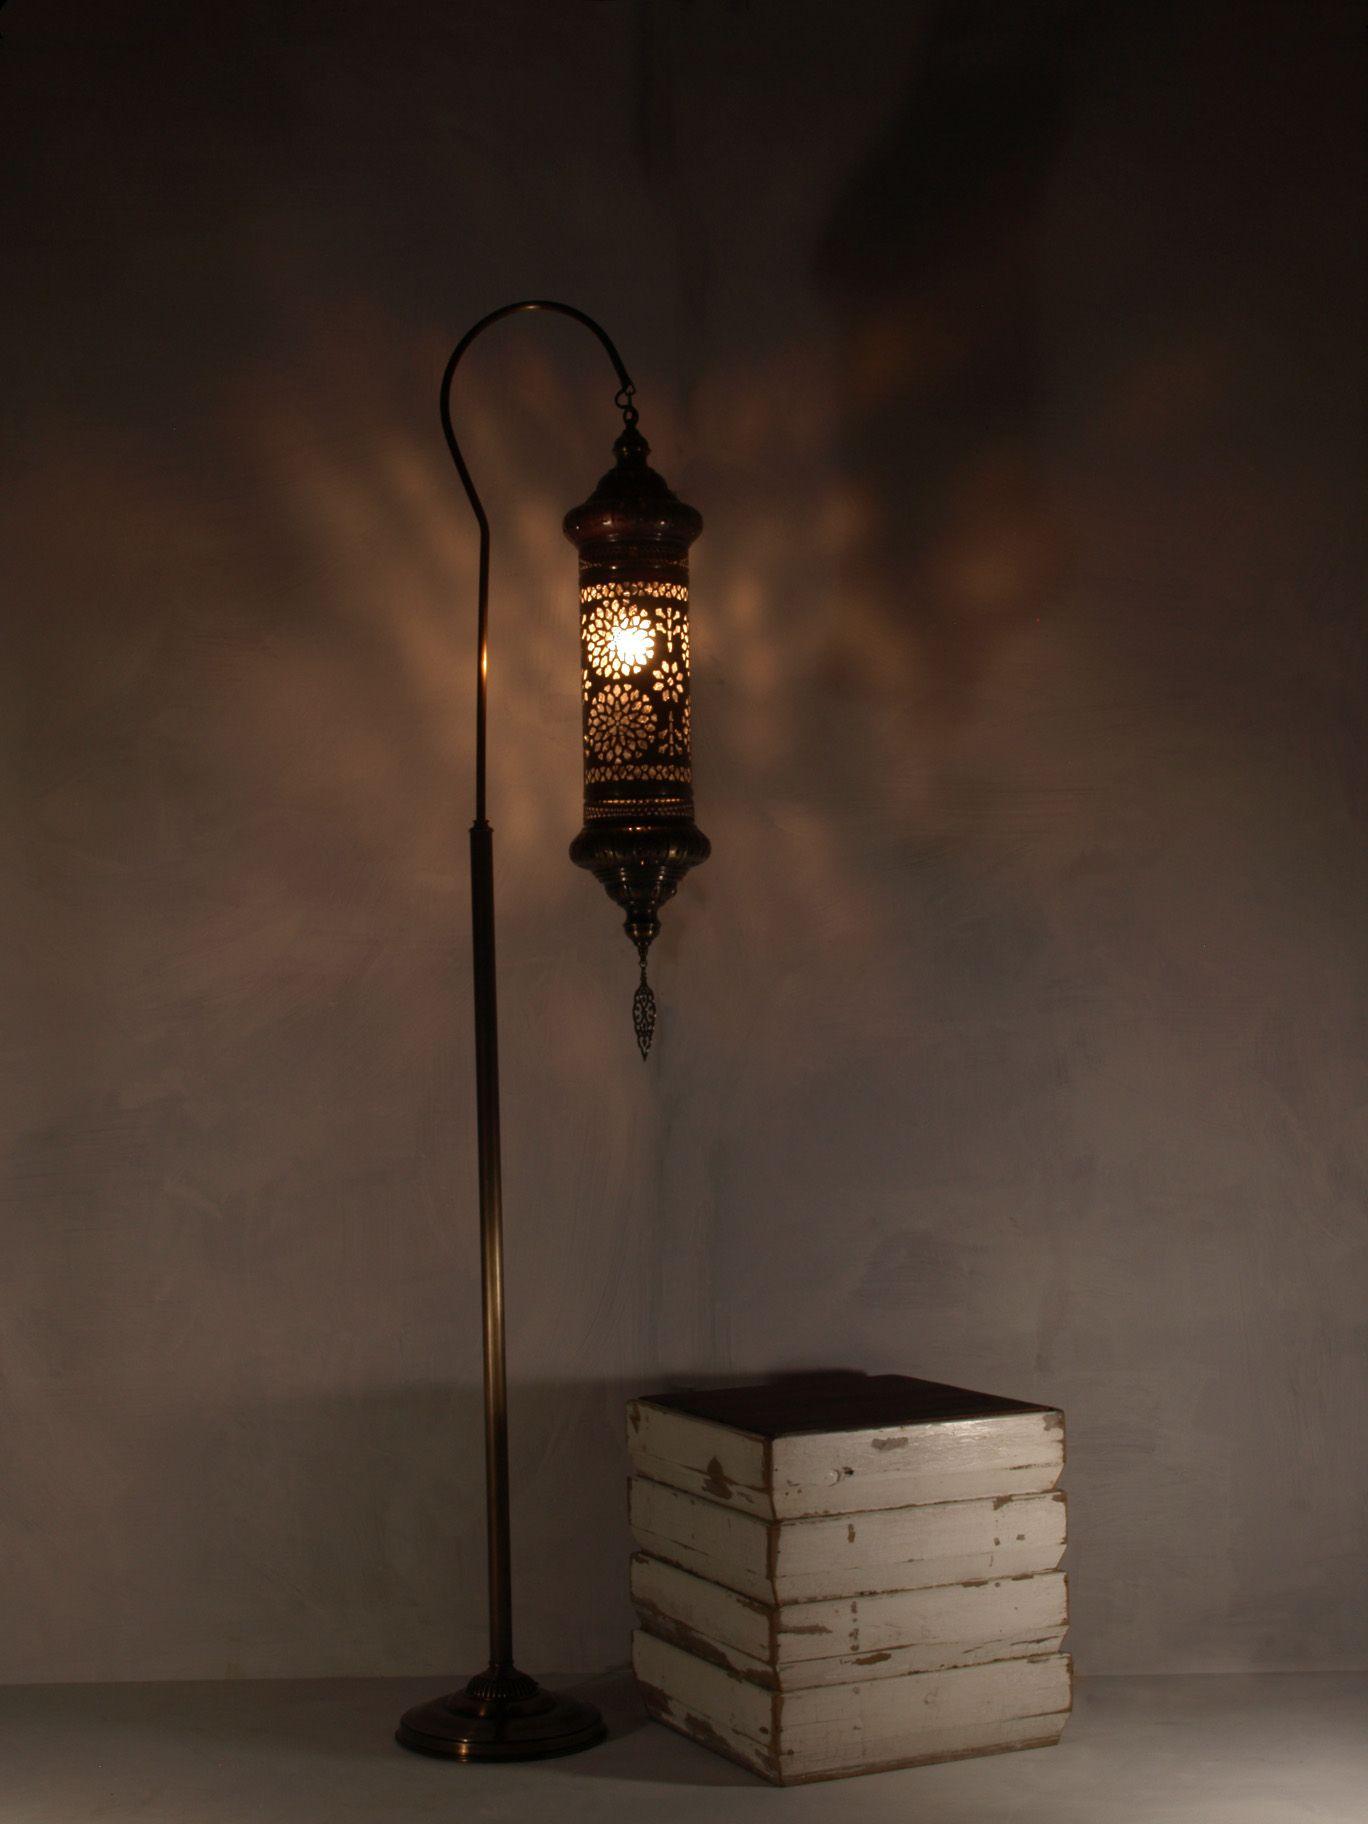 Hanging Lantern Floor Lamp The Dancing Pixie Lantern Floor Lamp Mosaic Candle Holders Mosaic Candle